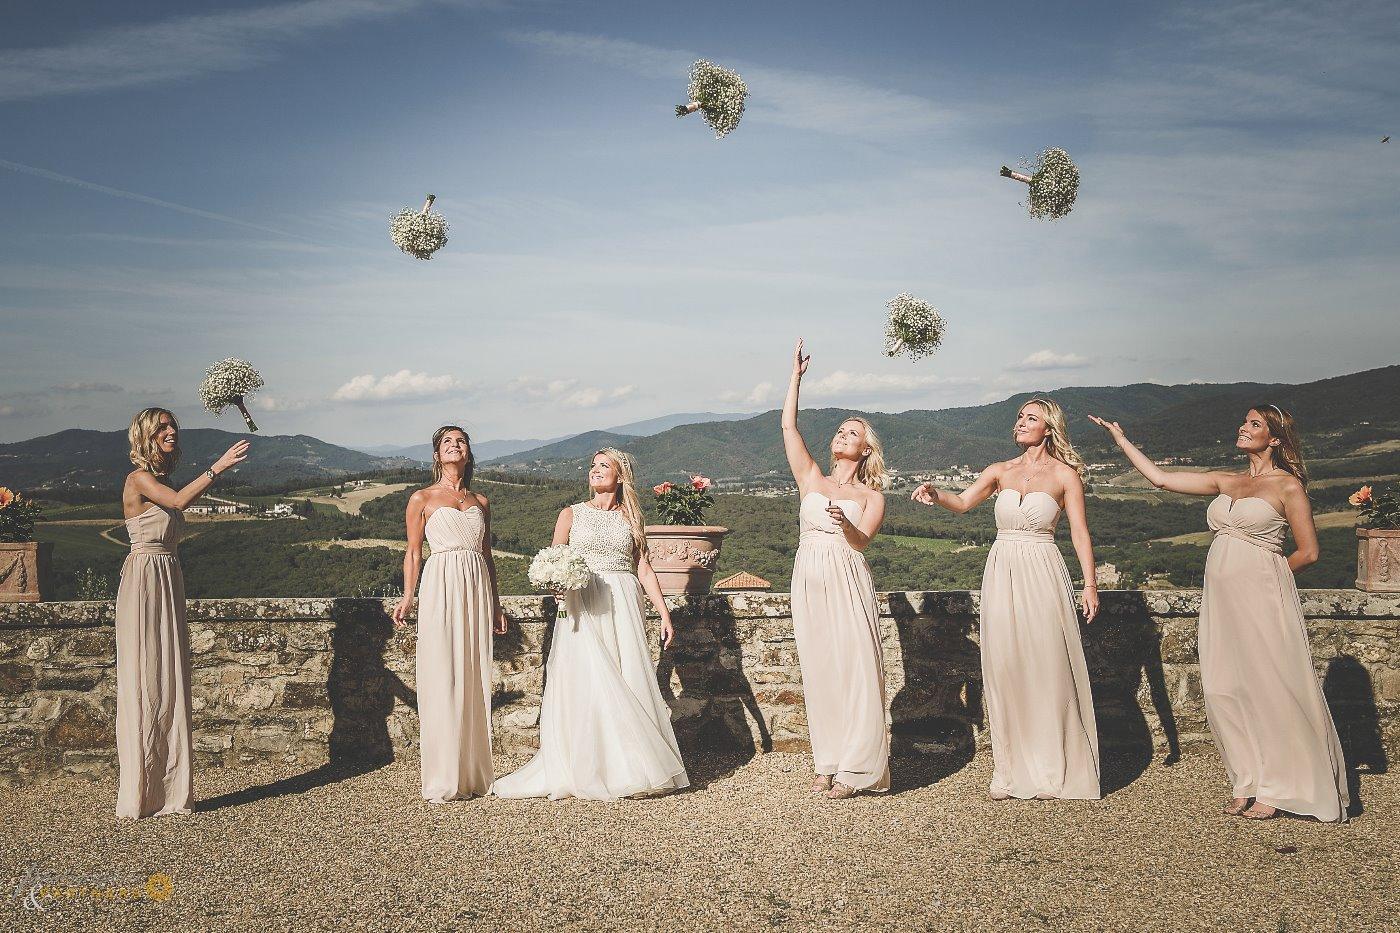 photo_weddings_castello_gabbiano_11.jpg